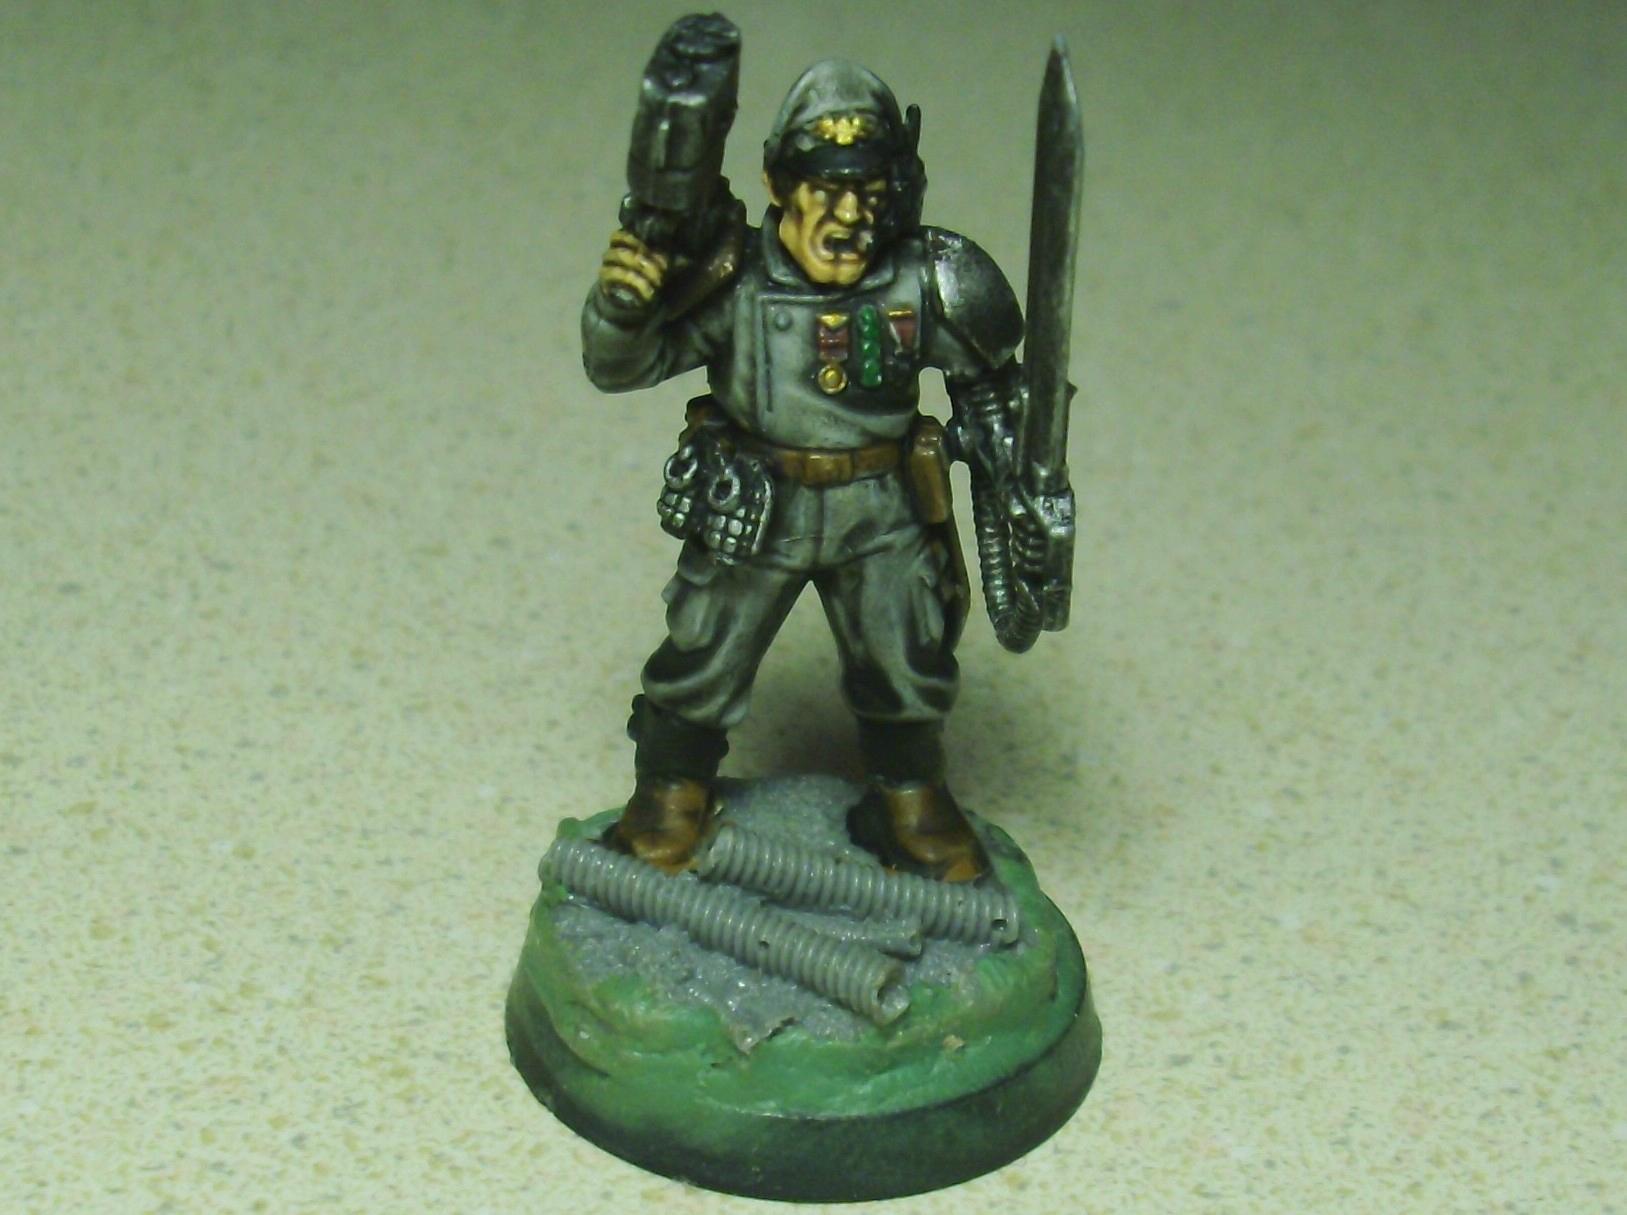 Astra Militarum, Imperial Guard, Straken, Warhammer 40,000